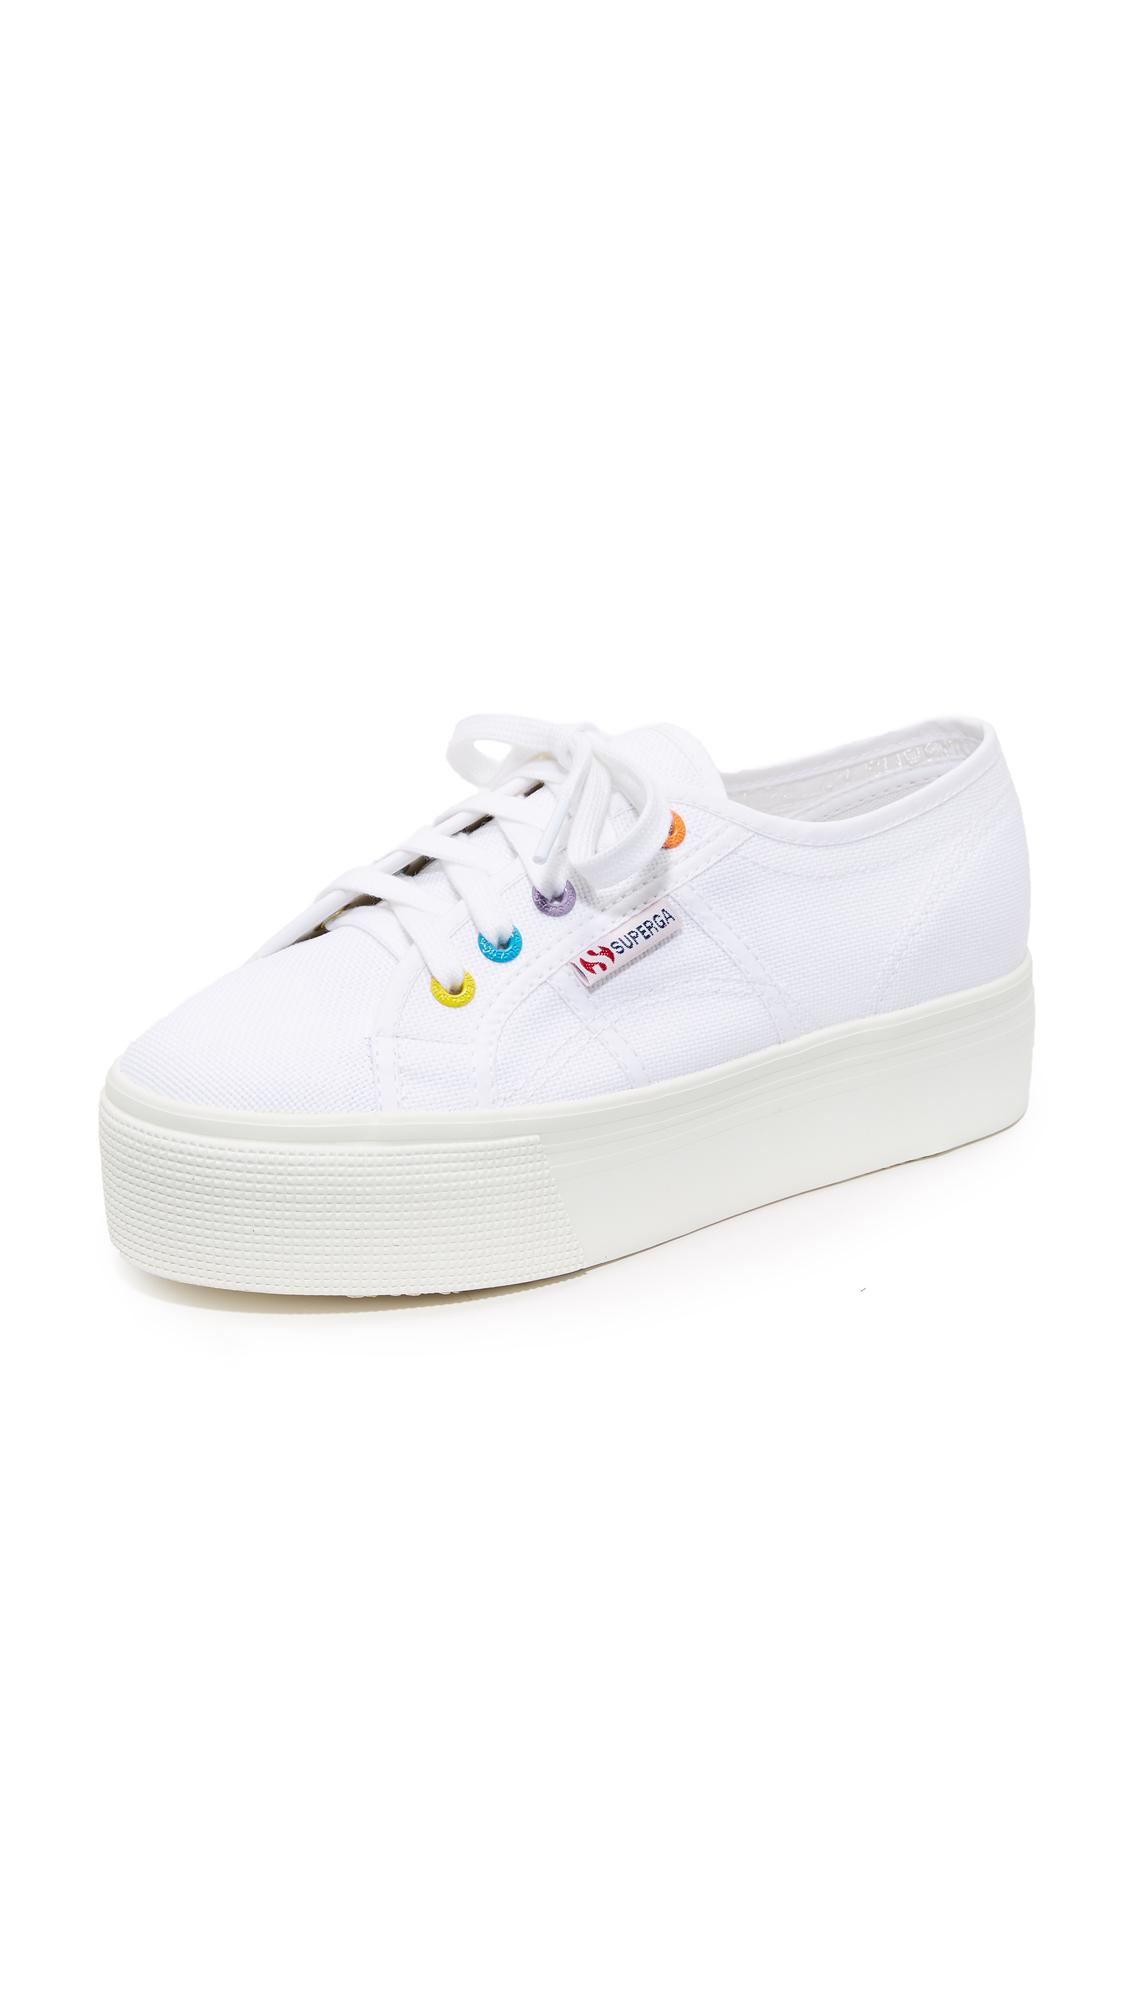 Superga 2790 Platform COTW Eyelet Classic Sneakers - White Multi